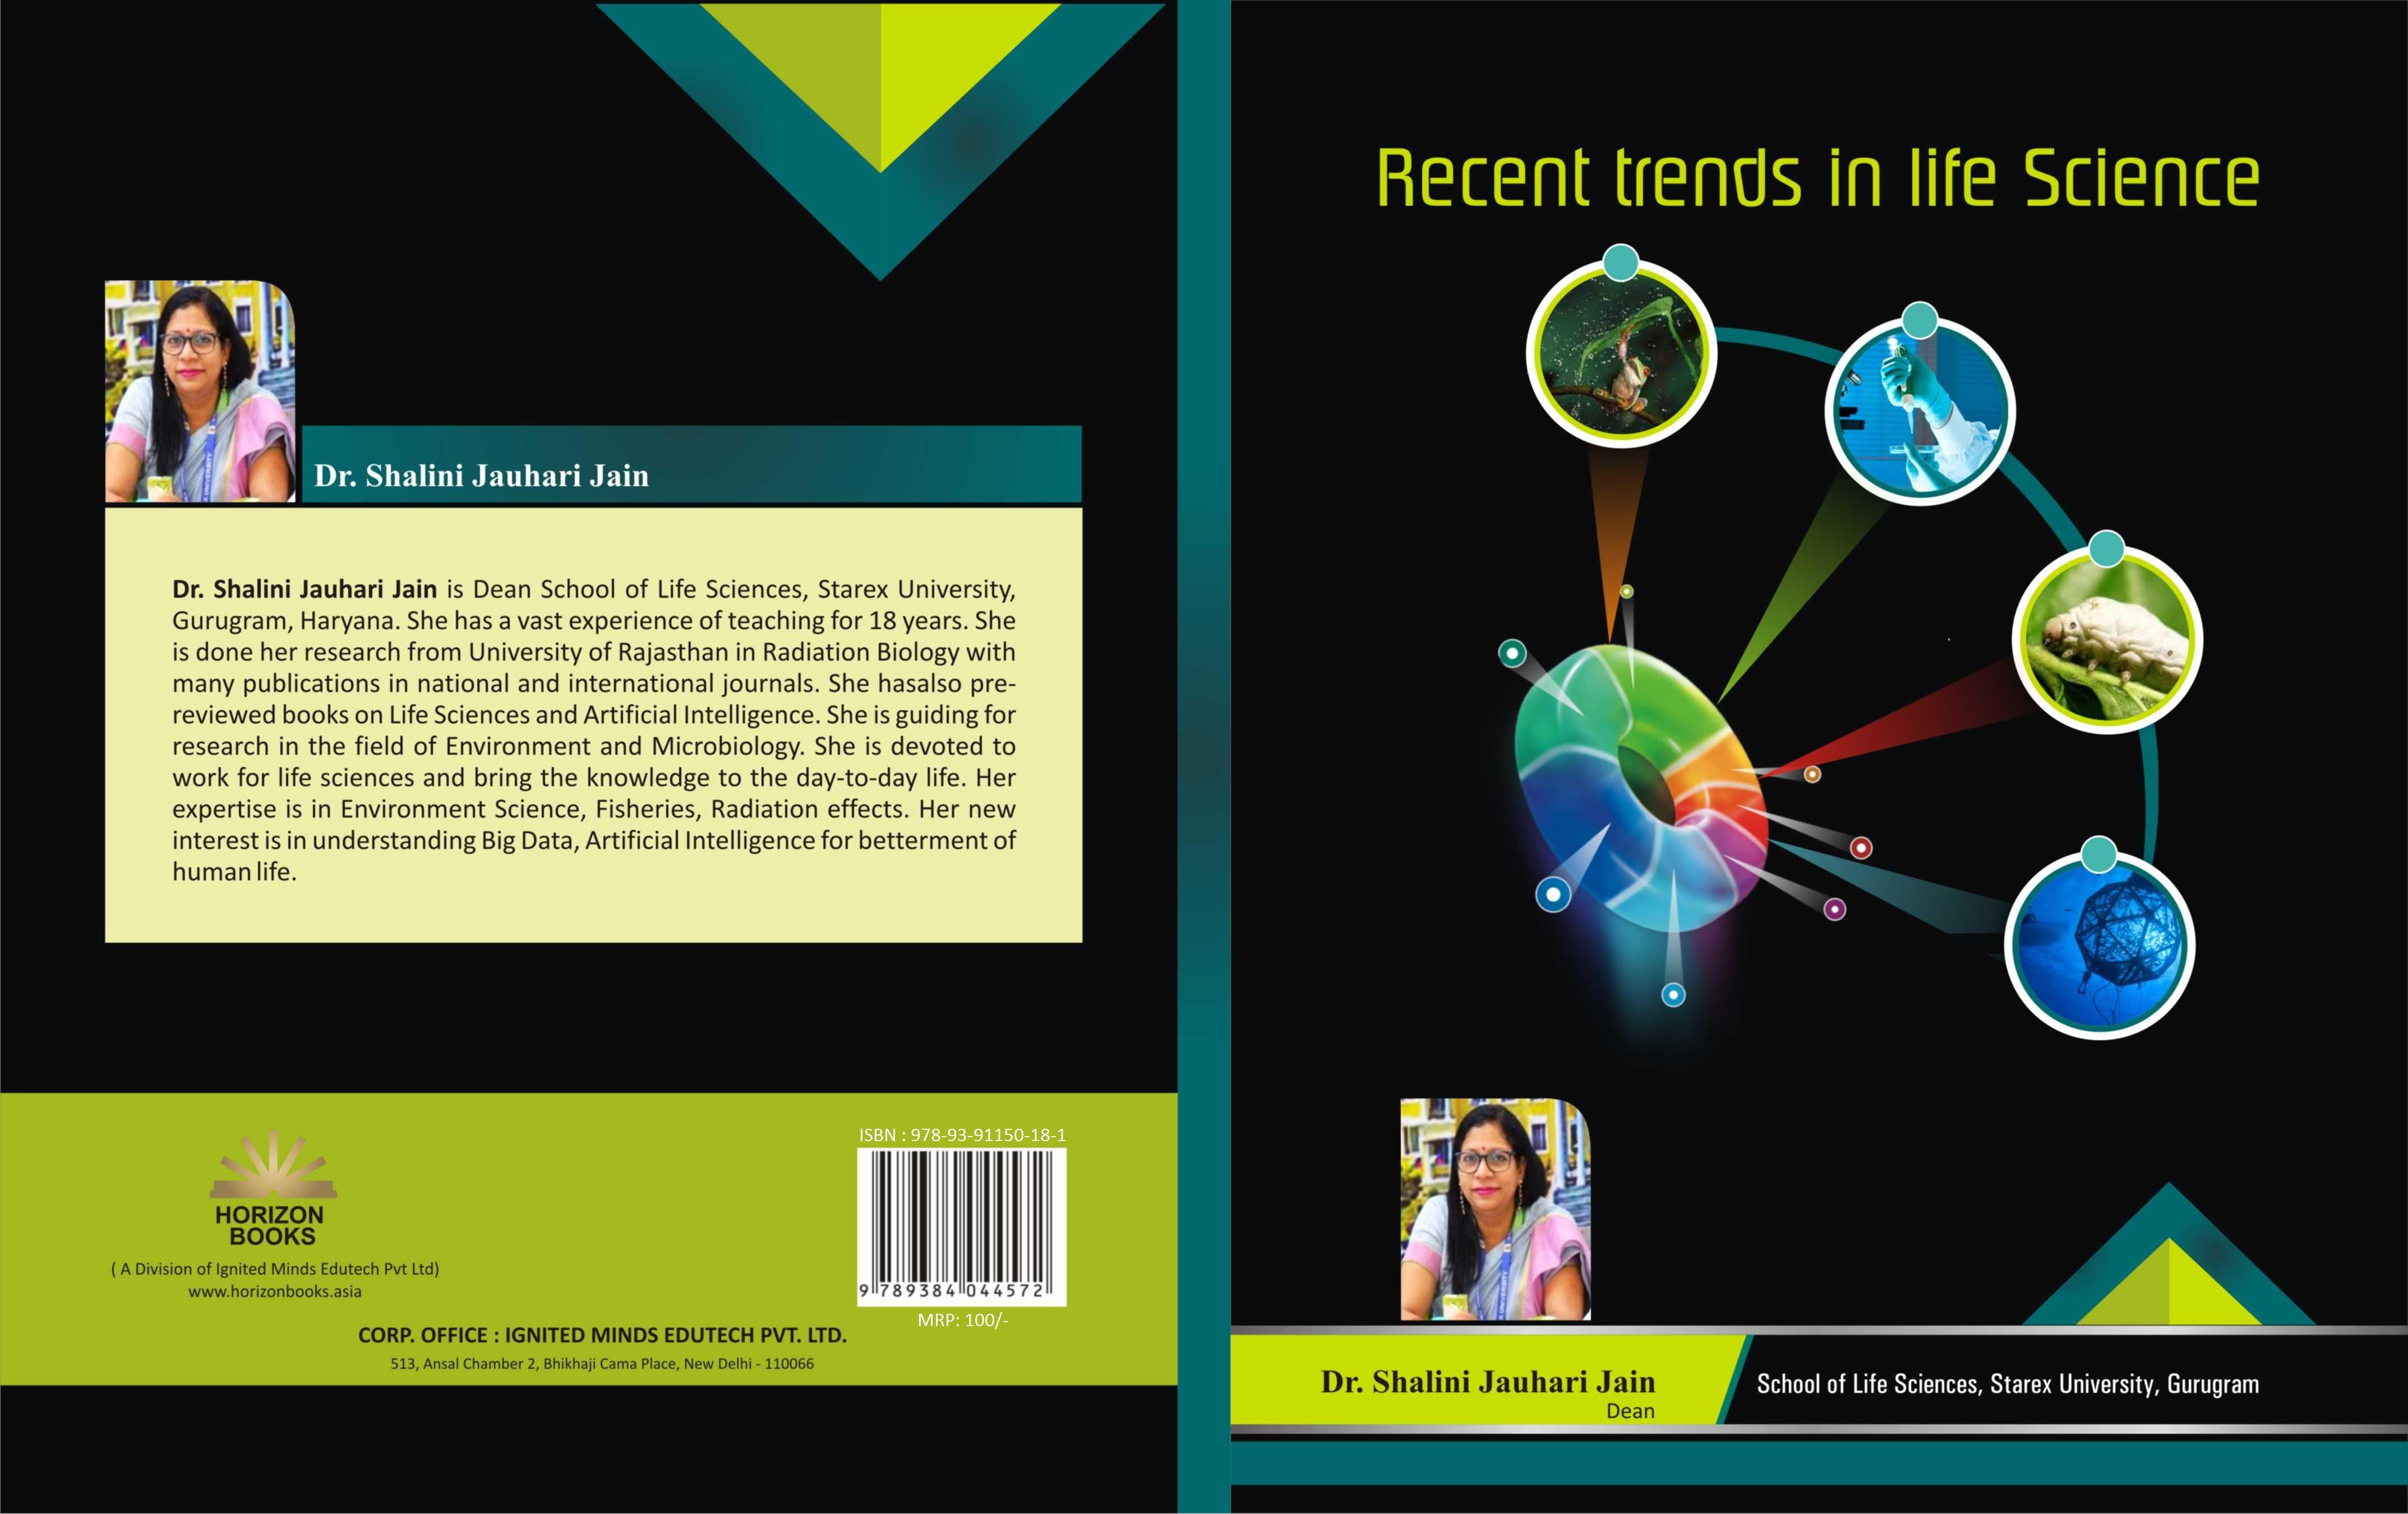 recent trends in life science